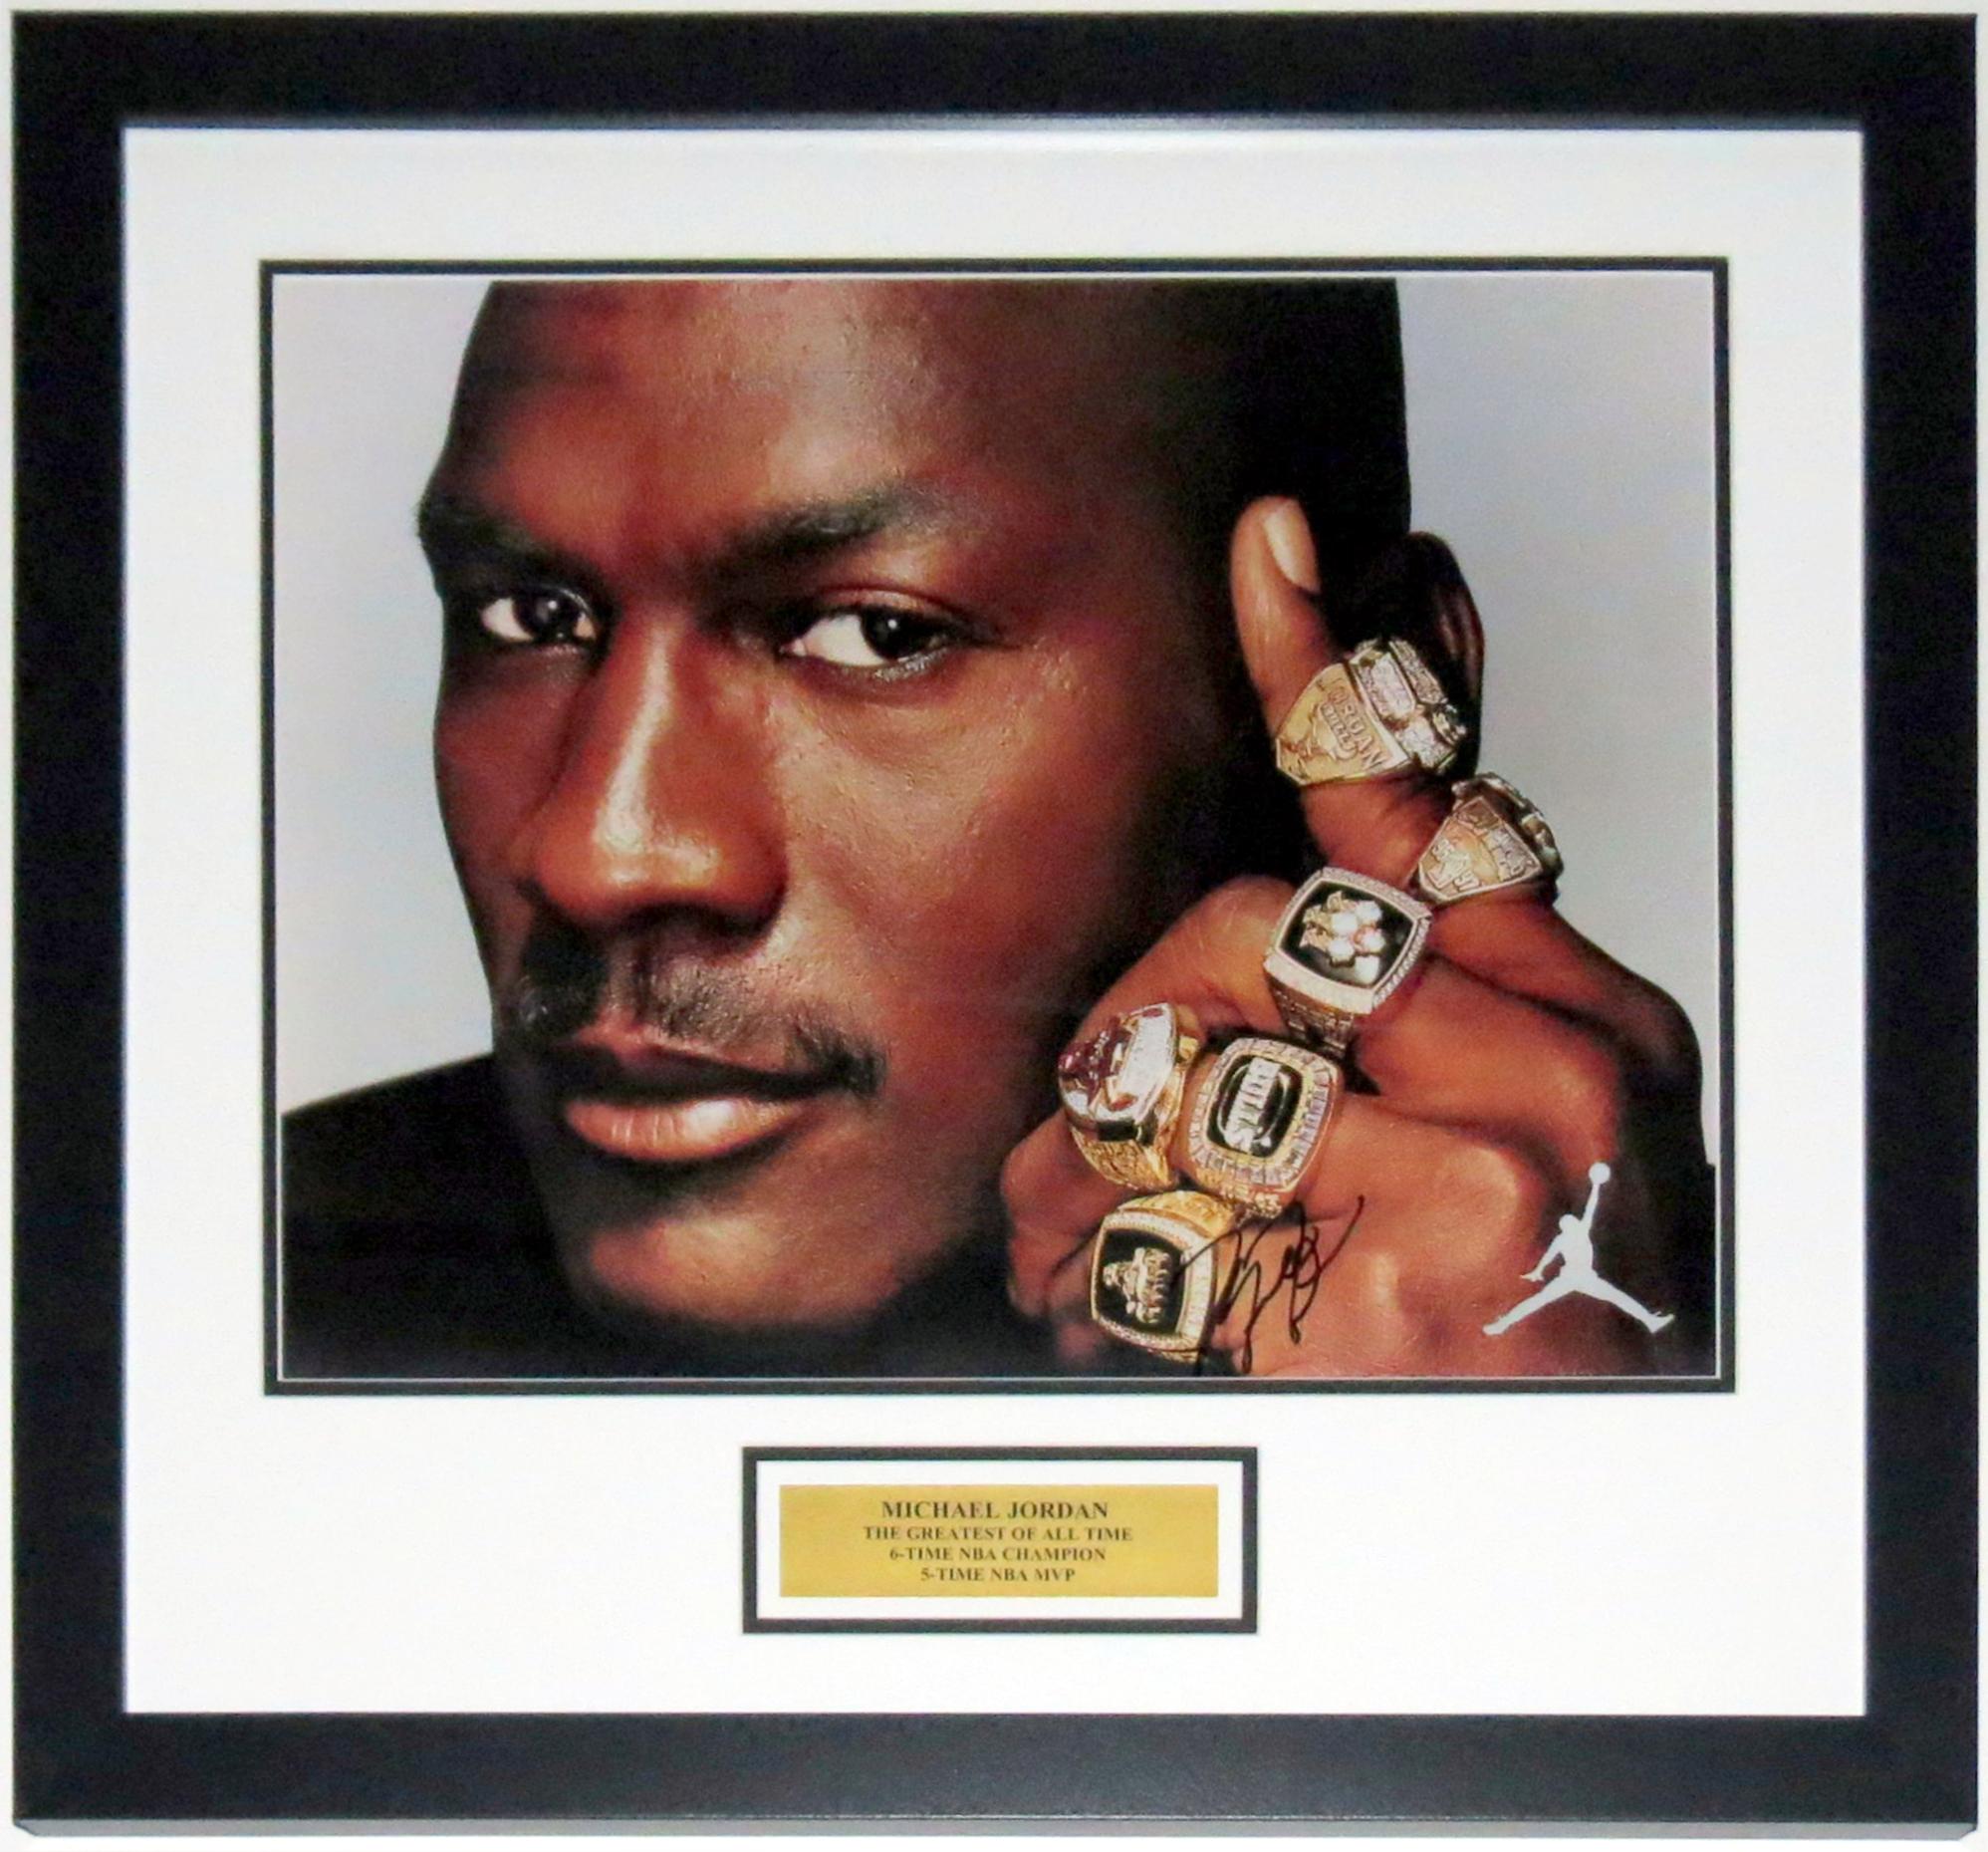 Michael Jordan Signed Chicago Bulls 6 Rings Air Jordan 16x20 Photo - JSA COA Authenticated - Professionally Framed & Plate